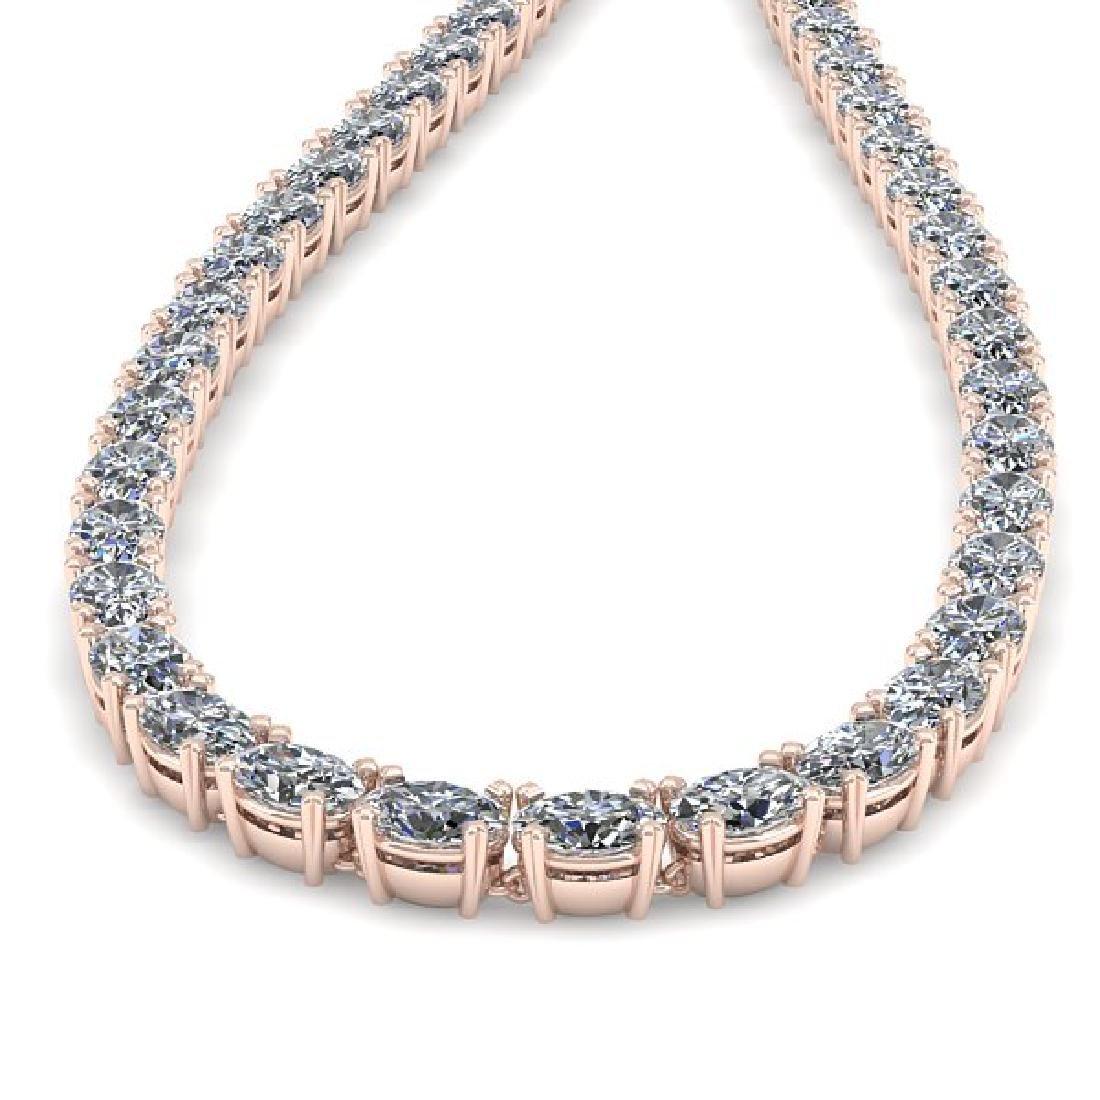 35 CTW Oval Cut Certified SI Diamond Necklace 18K Rose - 2